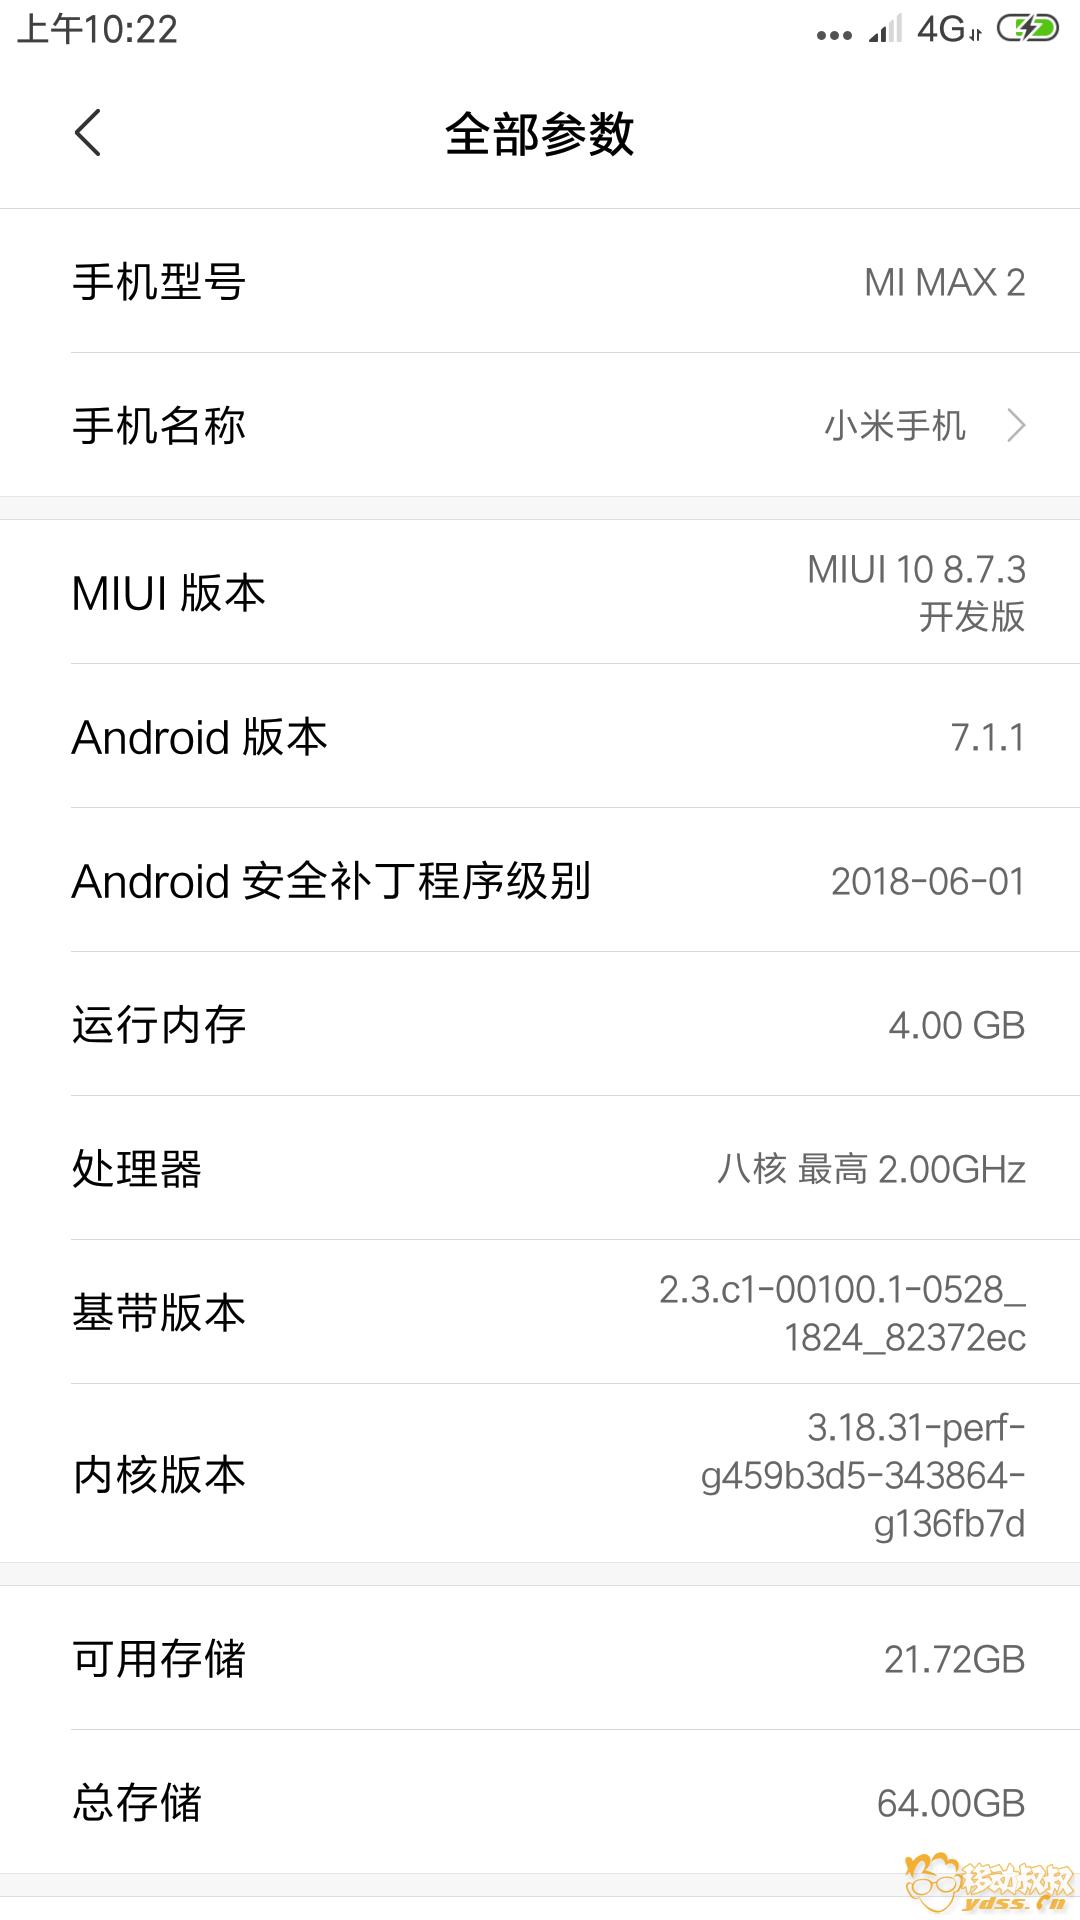 Screenshot_2018-07-04-10-22-10-082_com.android.settings.png